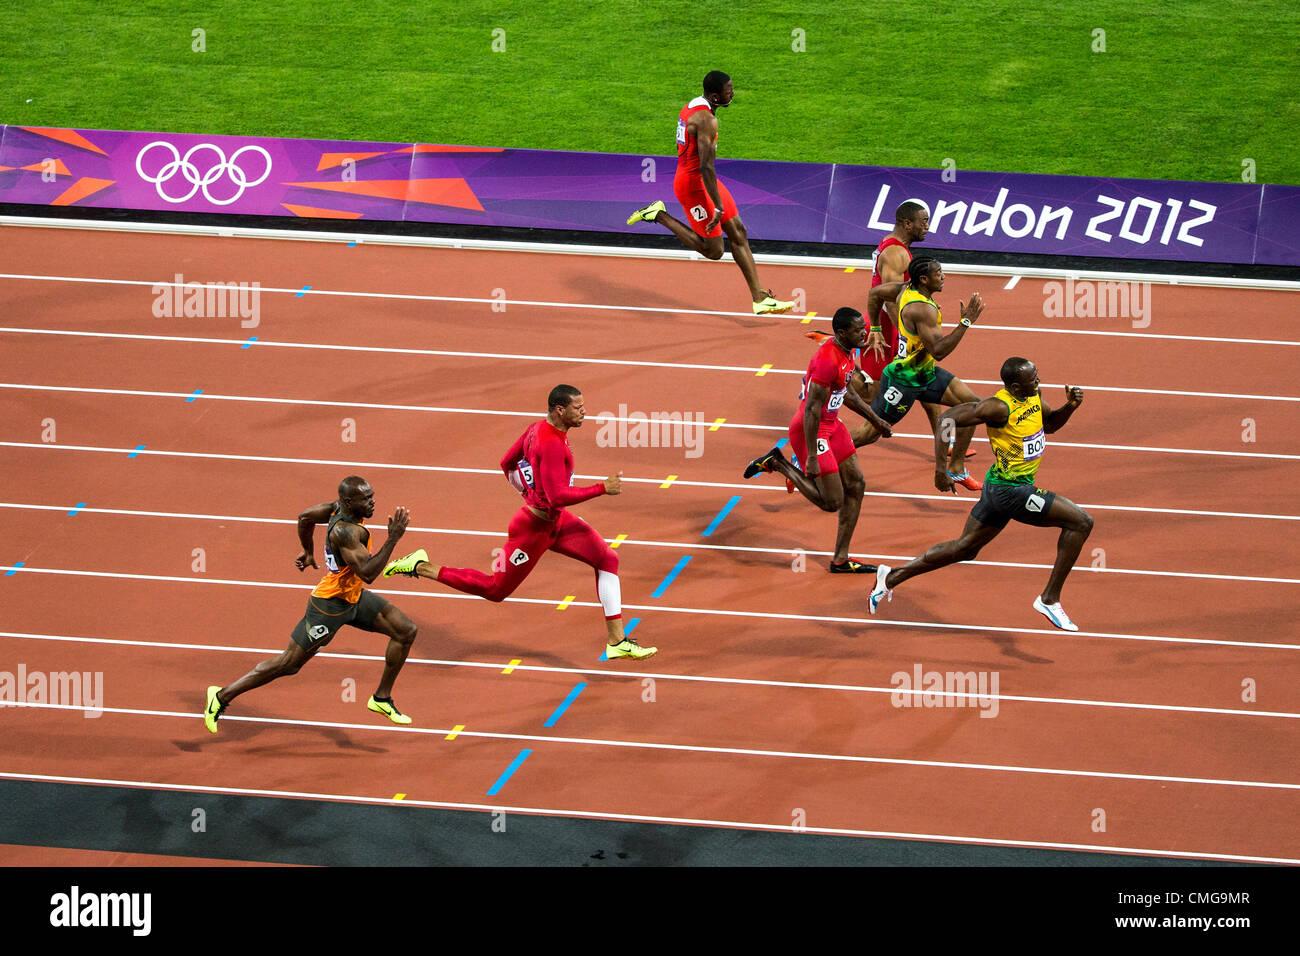 London 2012 Mens 100m Final